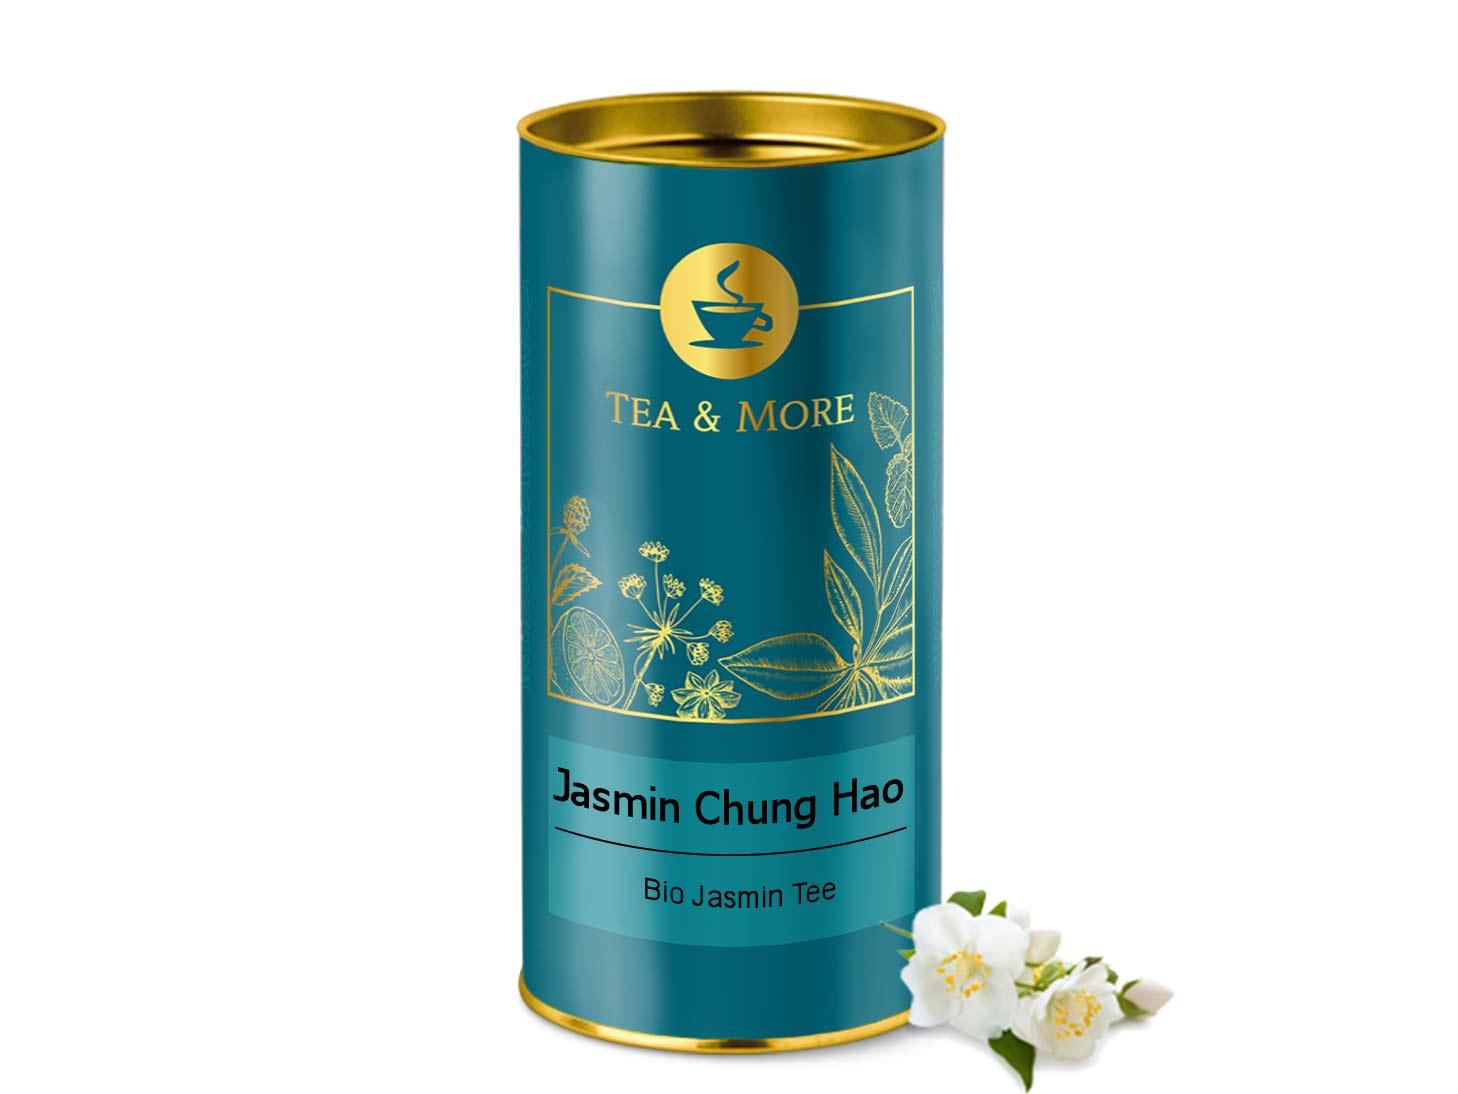 China Jasmintee Chung Hao (Bio)